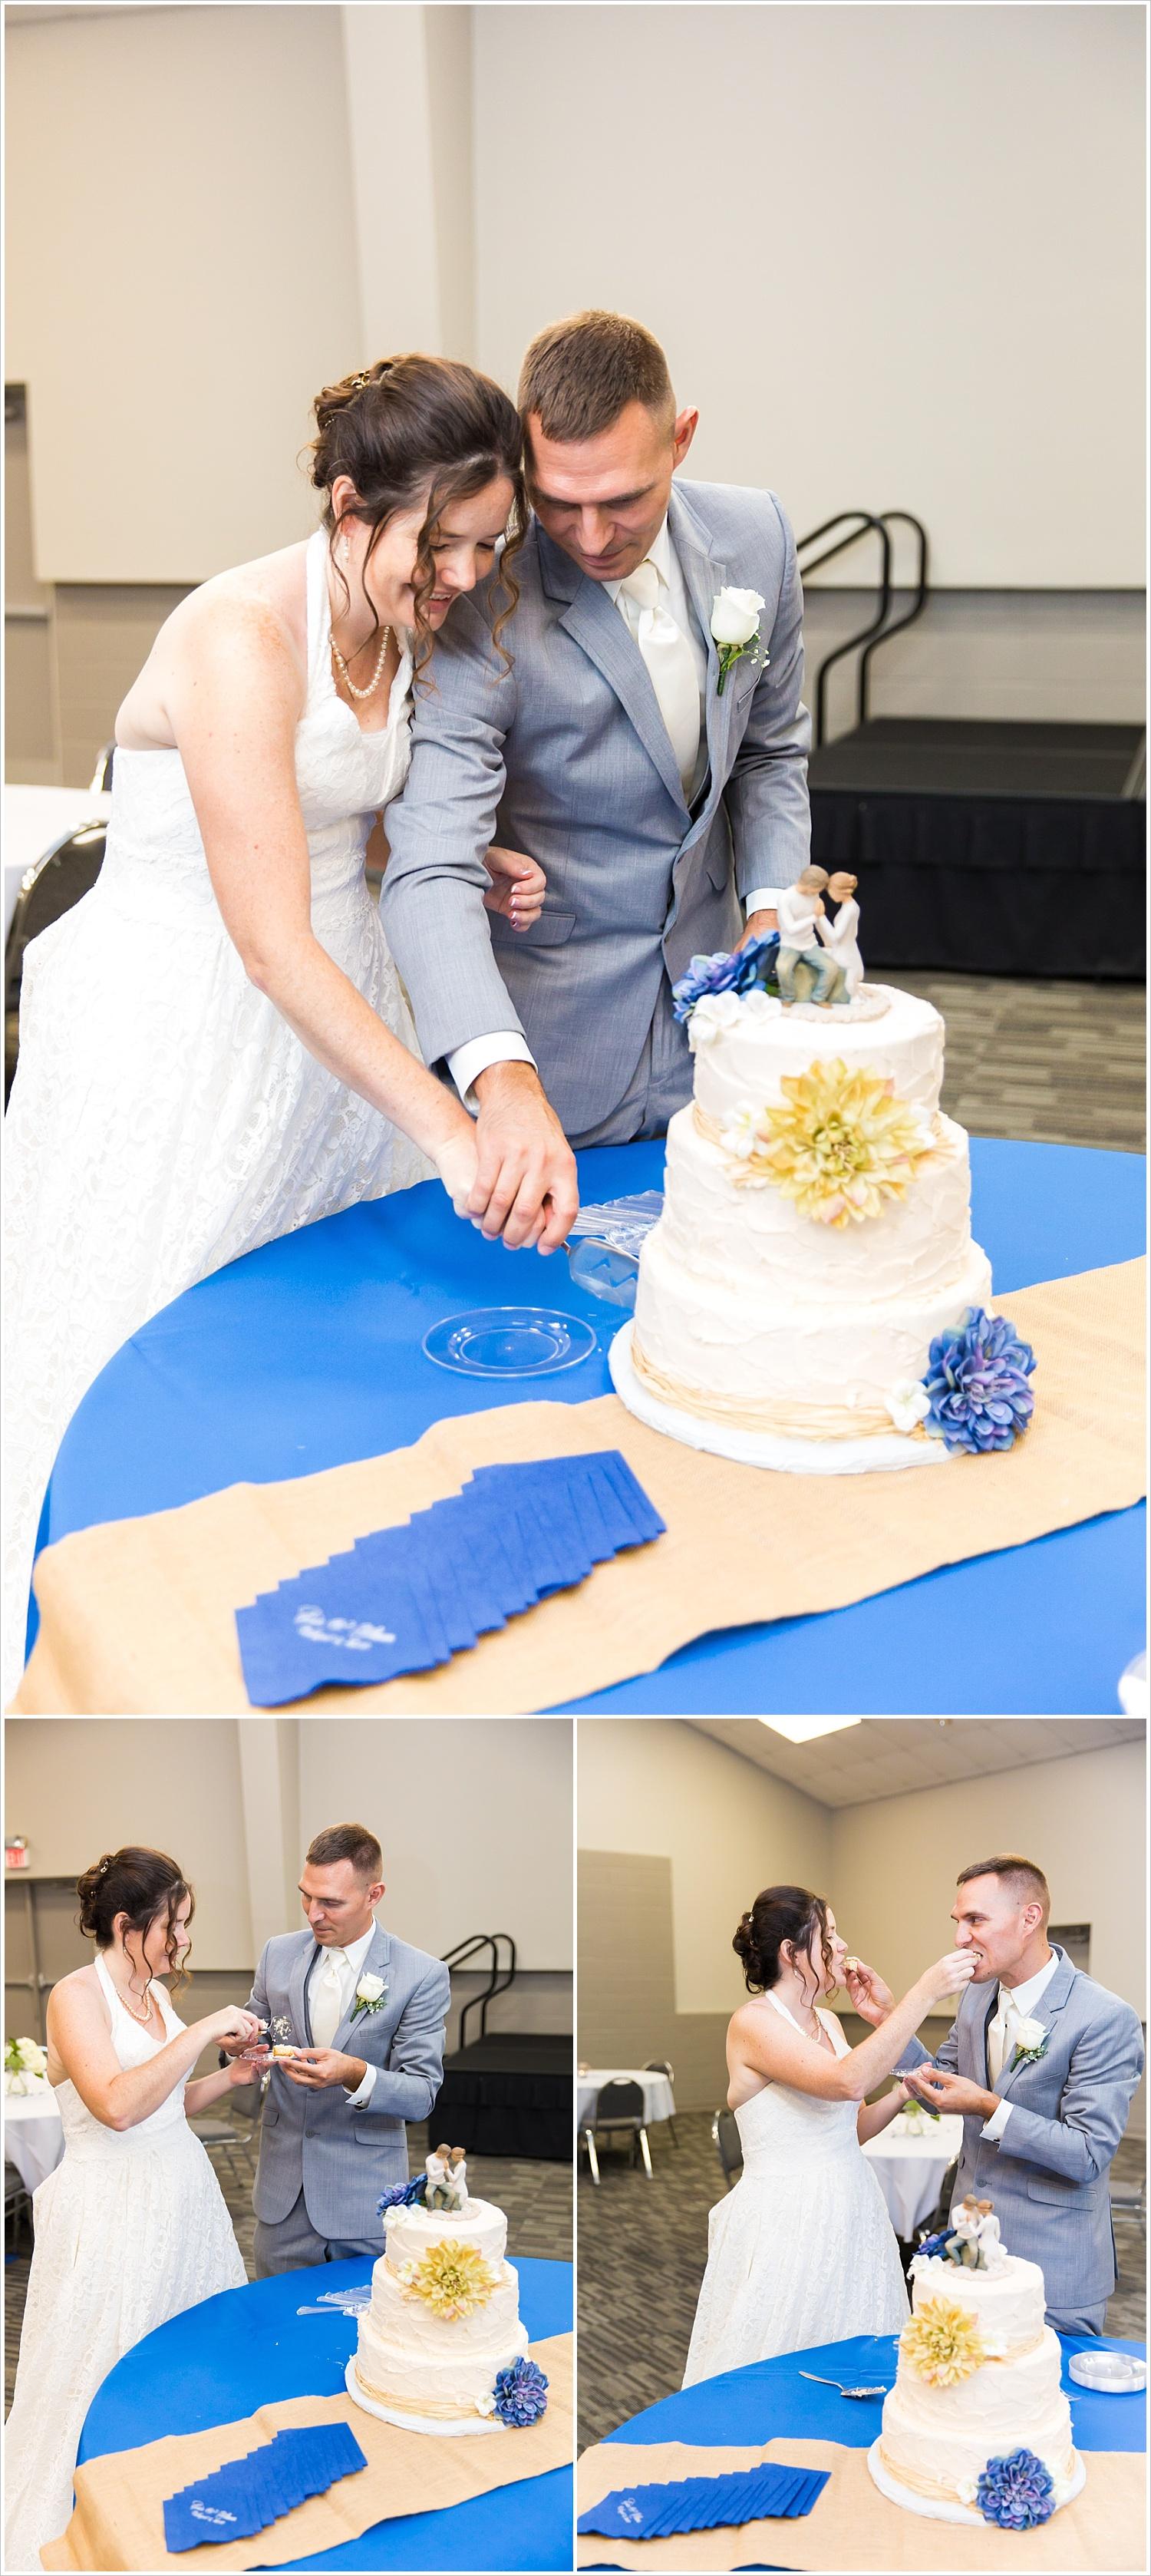 Bride and groom cut their wedding cake during a wedding reception at Central Presbyterian Church in Waco/Woodway, TX - Jason & Melaina Photography, www.jasonandmelaina.com